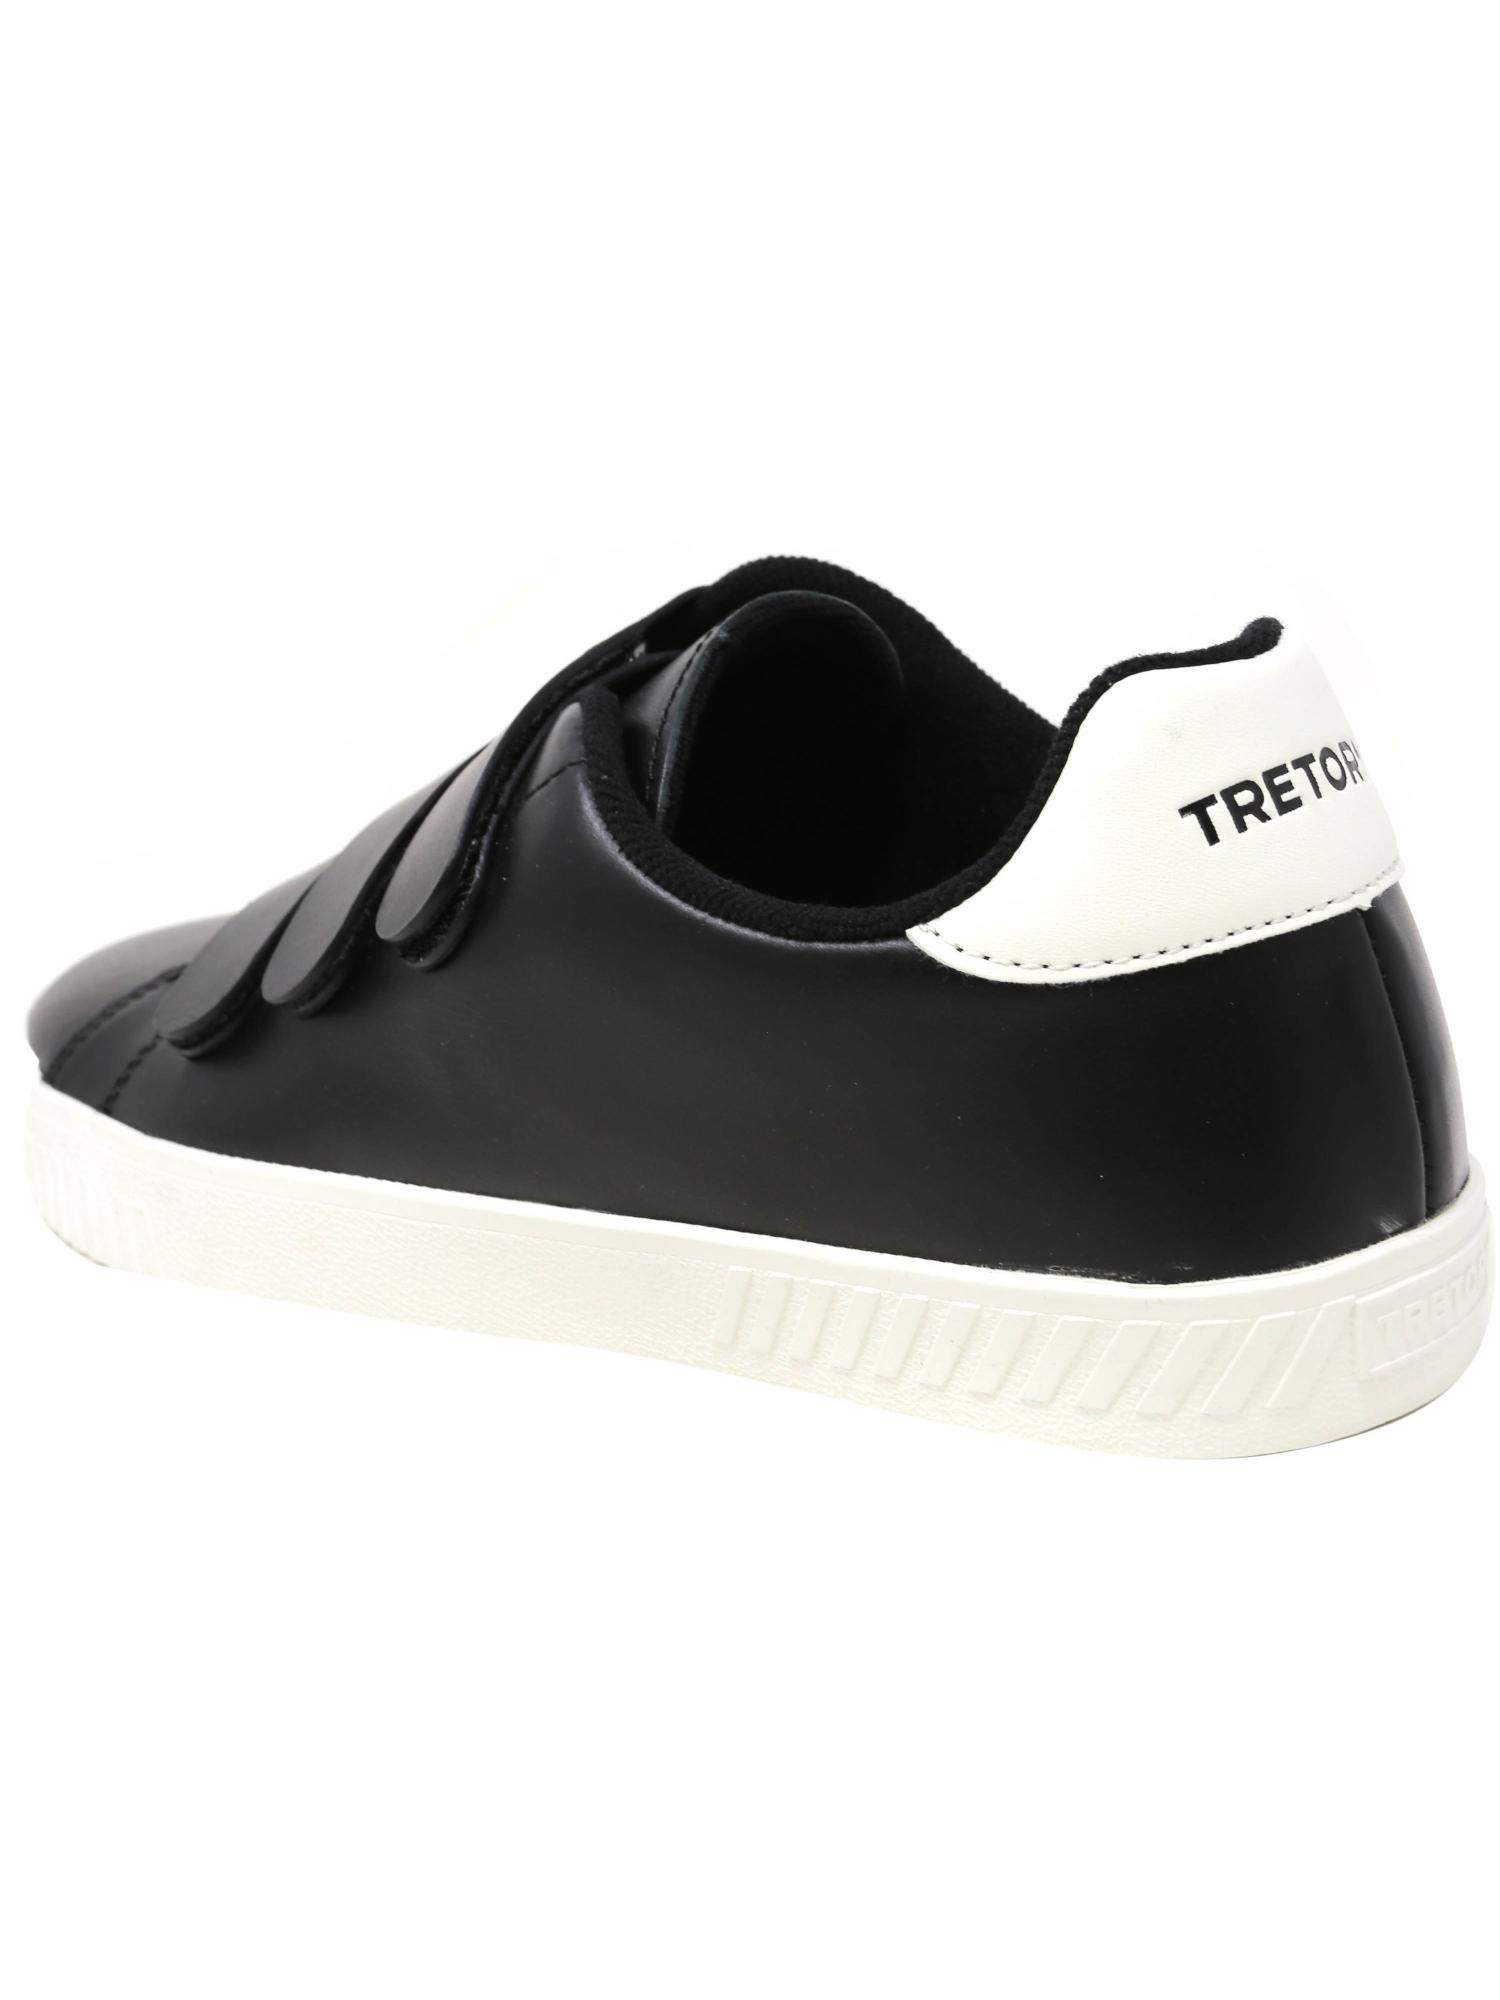 Homme-Tretorn-Transporter-2-en-Cuir-Cheville-High-Fashion-Sneaker miniature 6